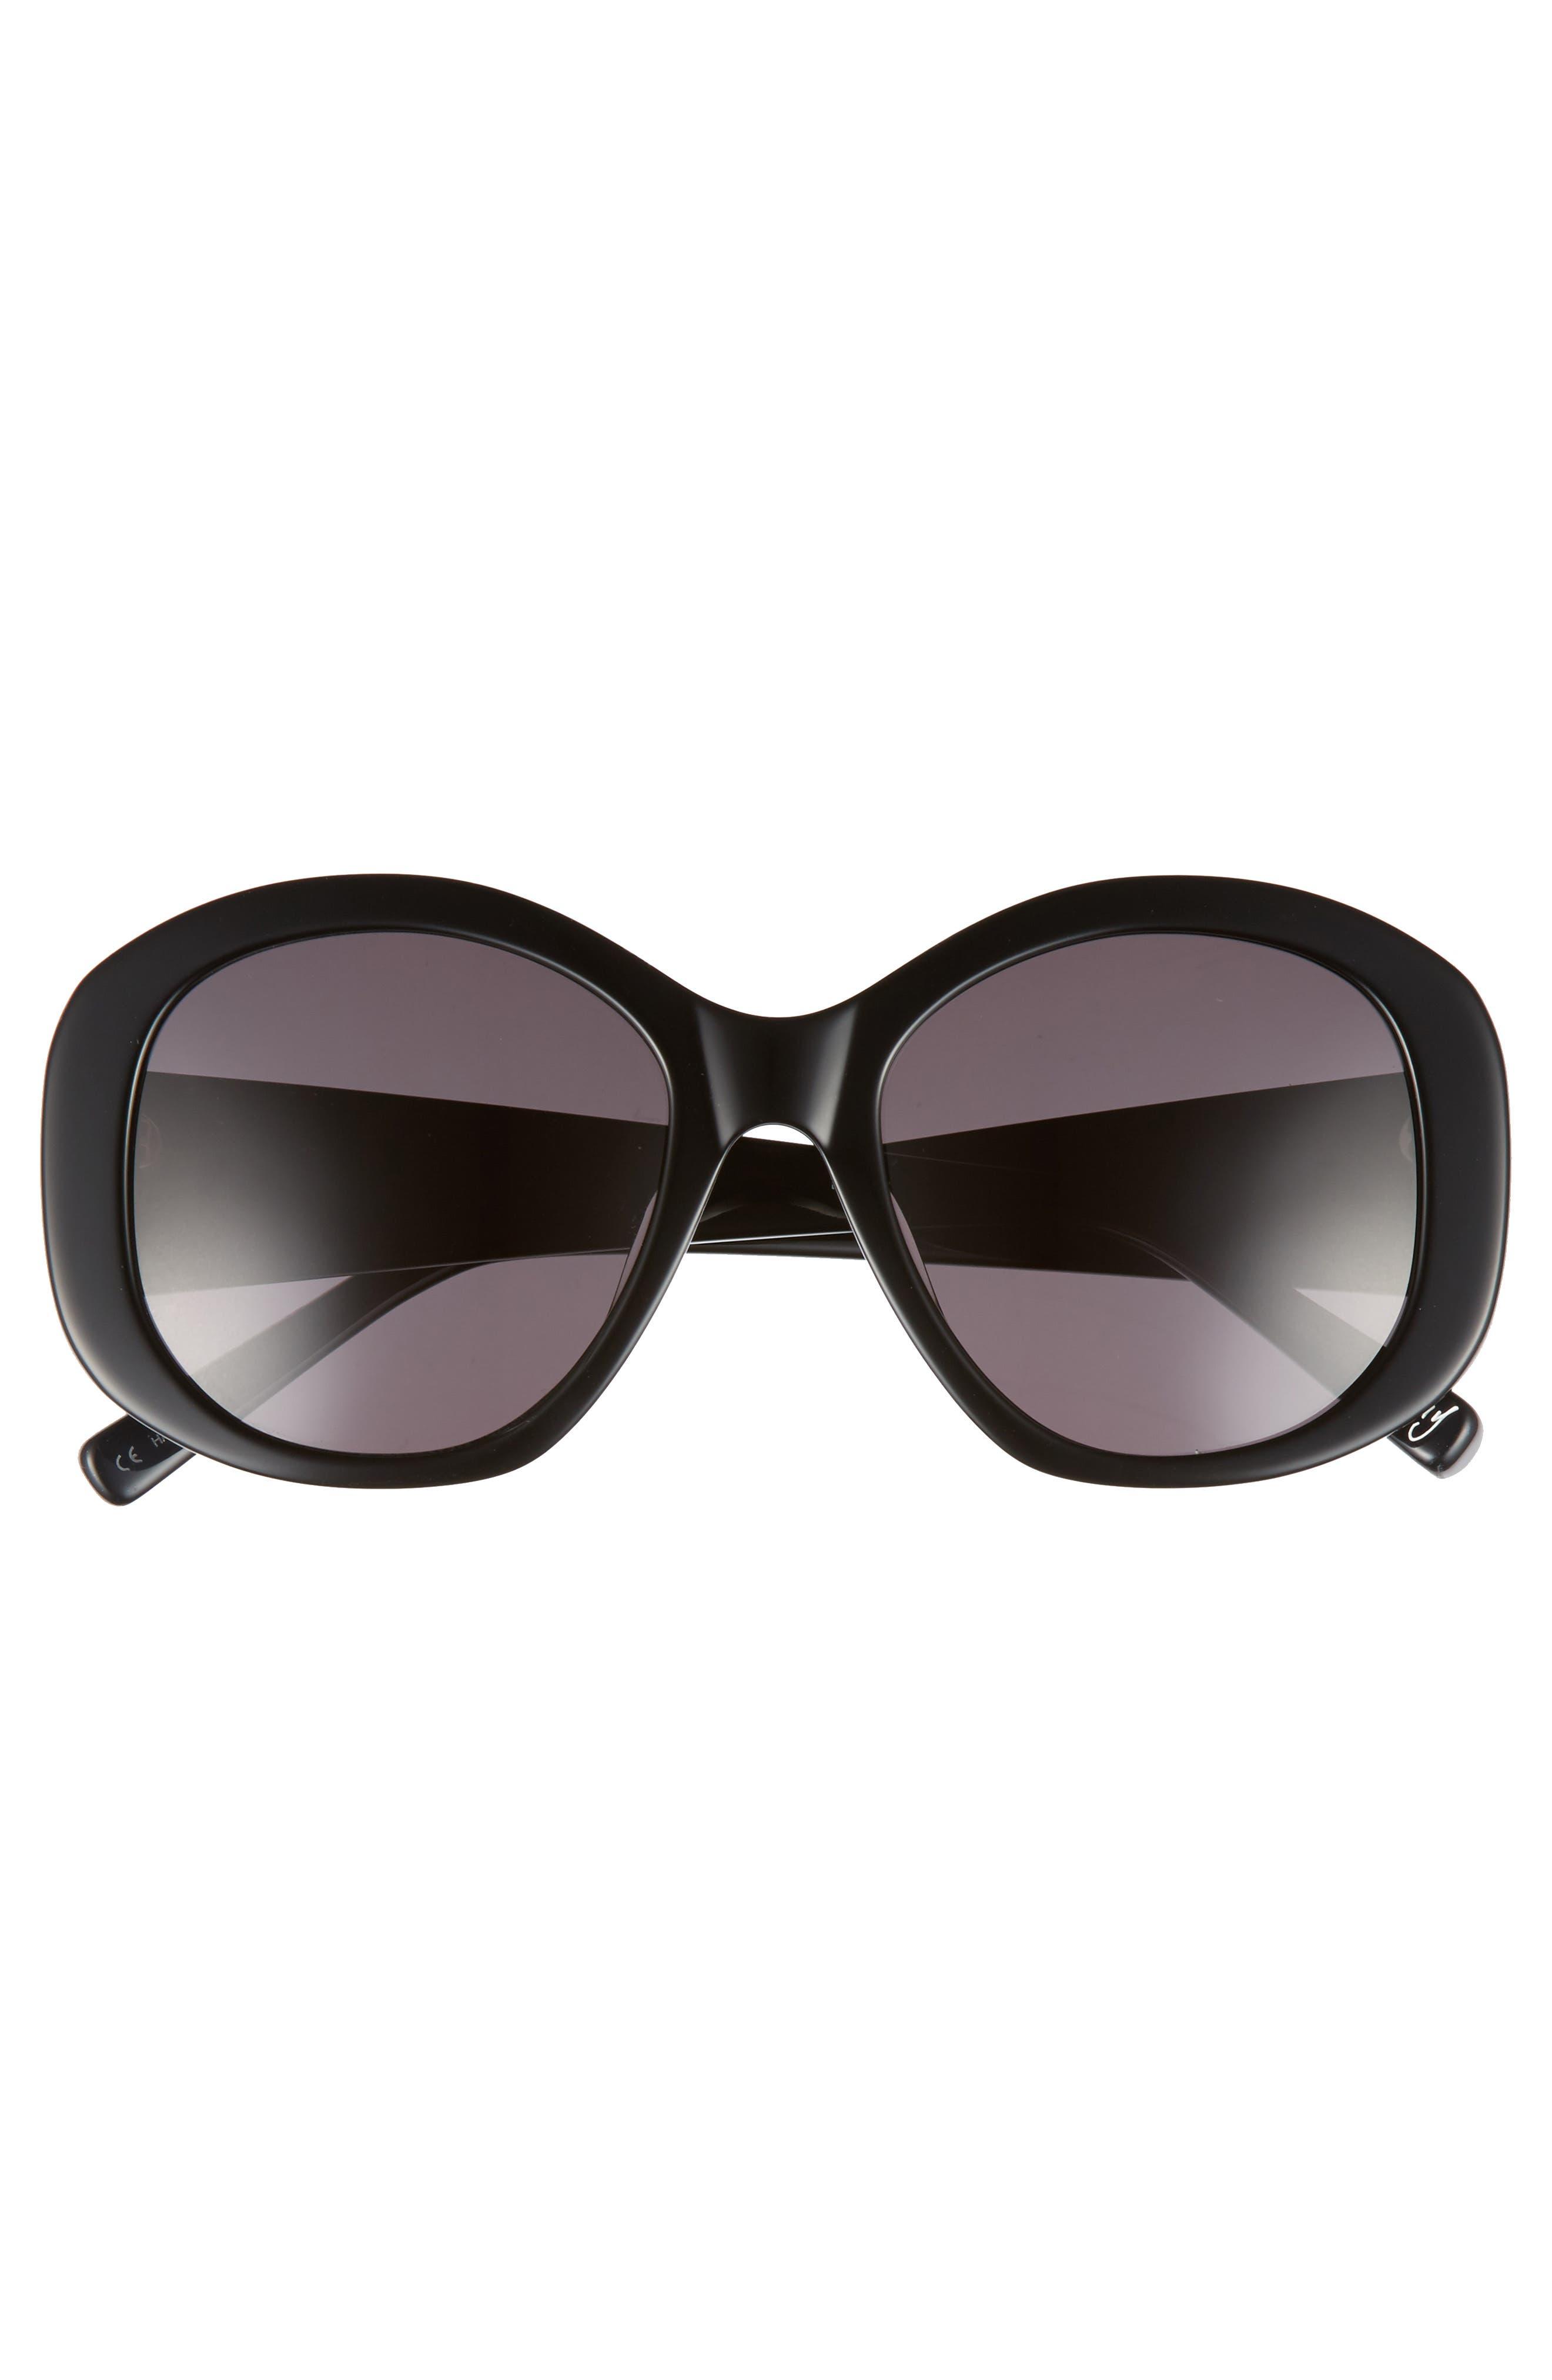 Kay 54mm Round Sunglasses,                             Alternate thumbnail 3, color,                             001